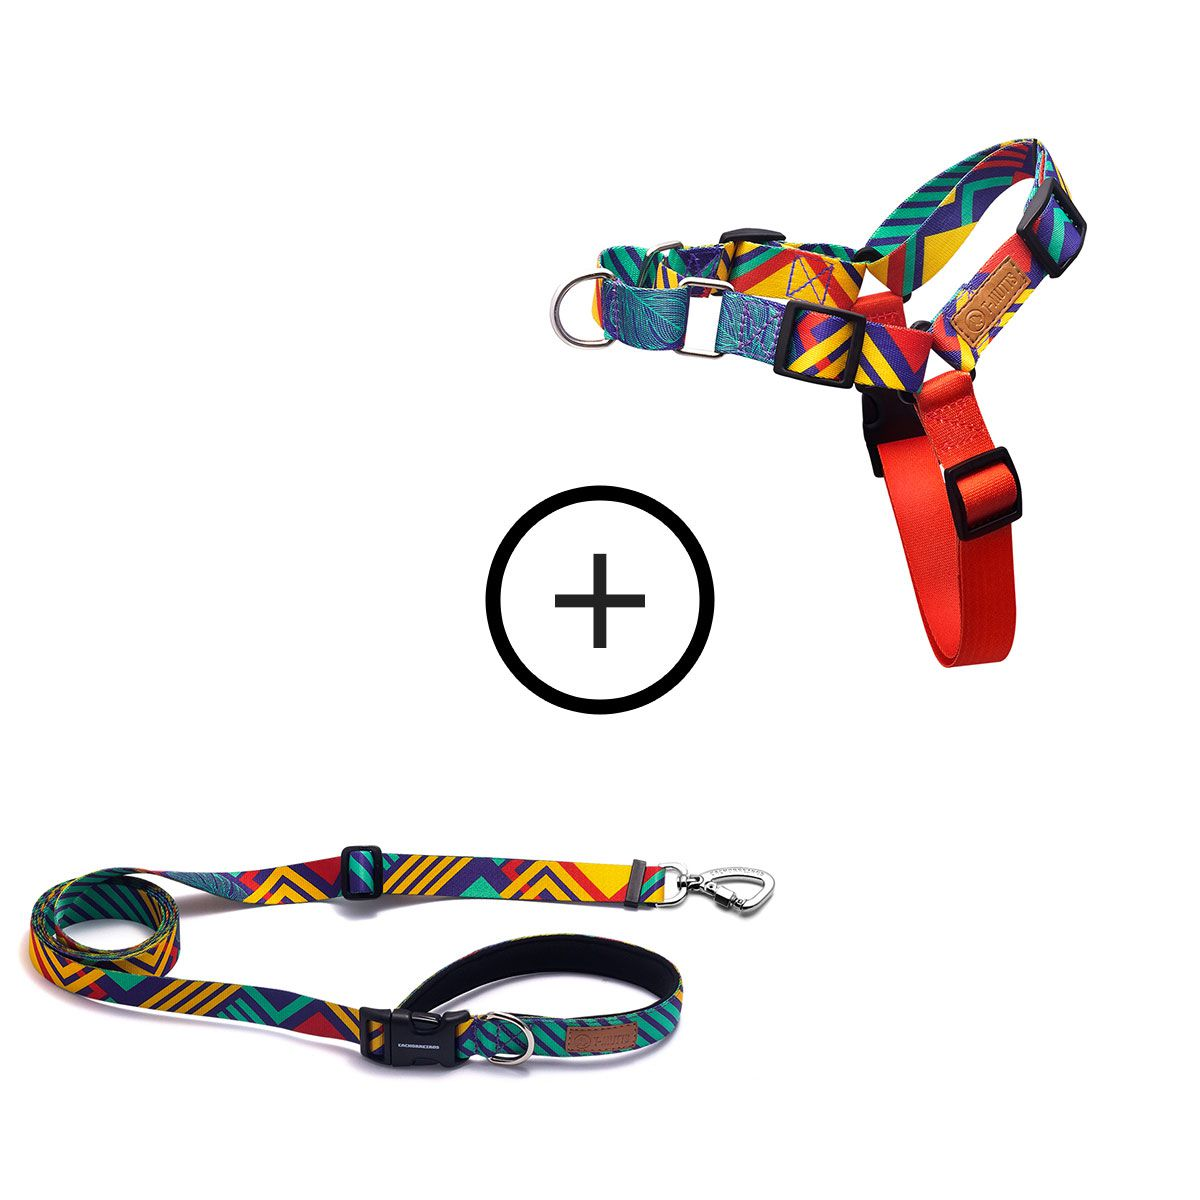 Kit para Correr: Peitoral Anti-Puxão + Guia Running T-Mutts